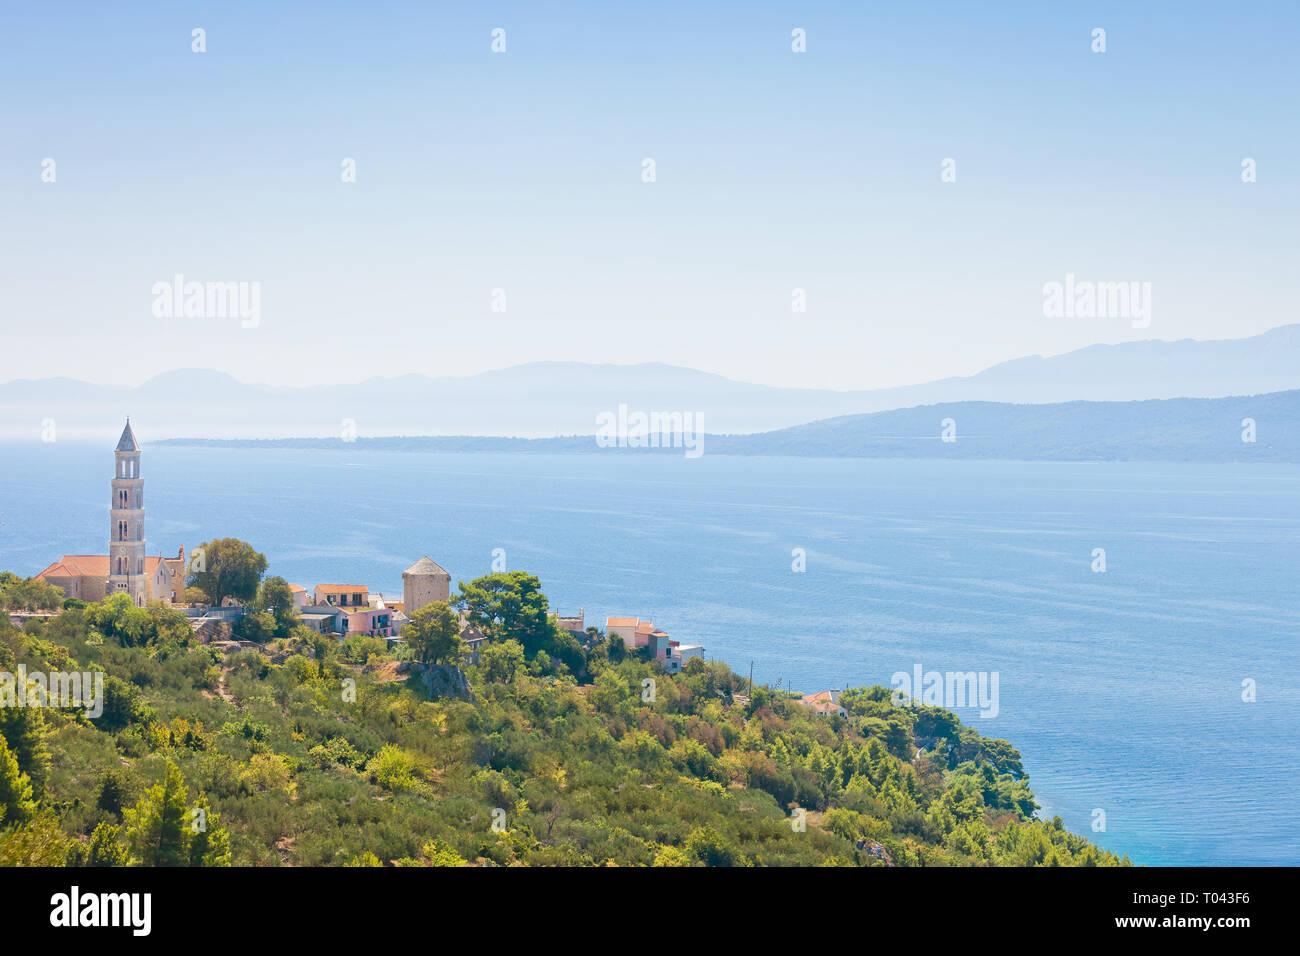 Igrane, Dalmatien, Kroatien, Europa - Kirchturm oben auf dem Berg von Igrane Stockfoto